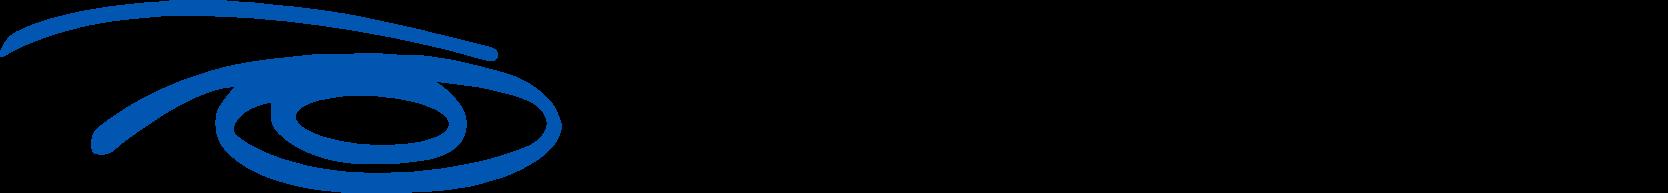 Eyelid-Pros-Logo_Horizontal_B-Bk